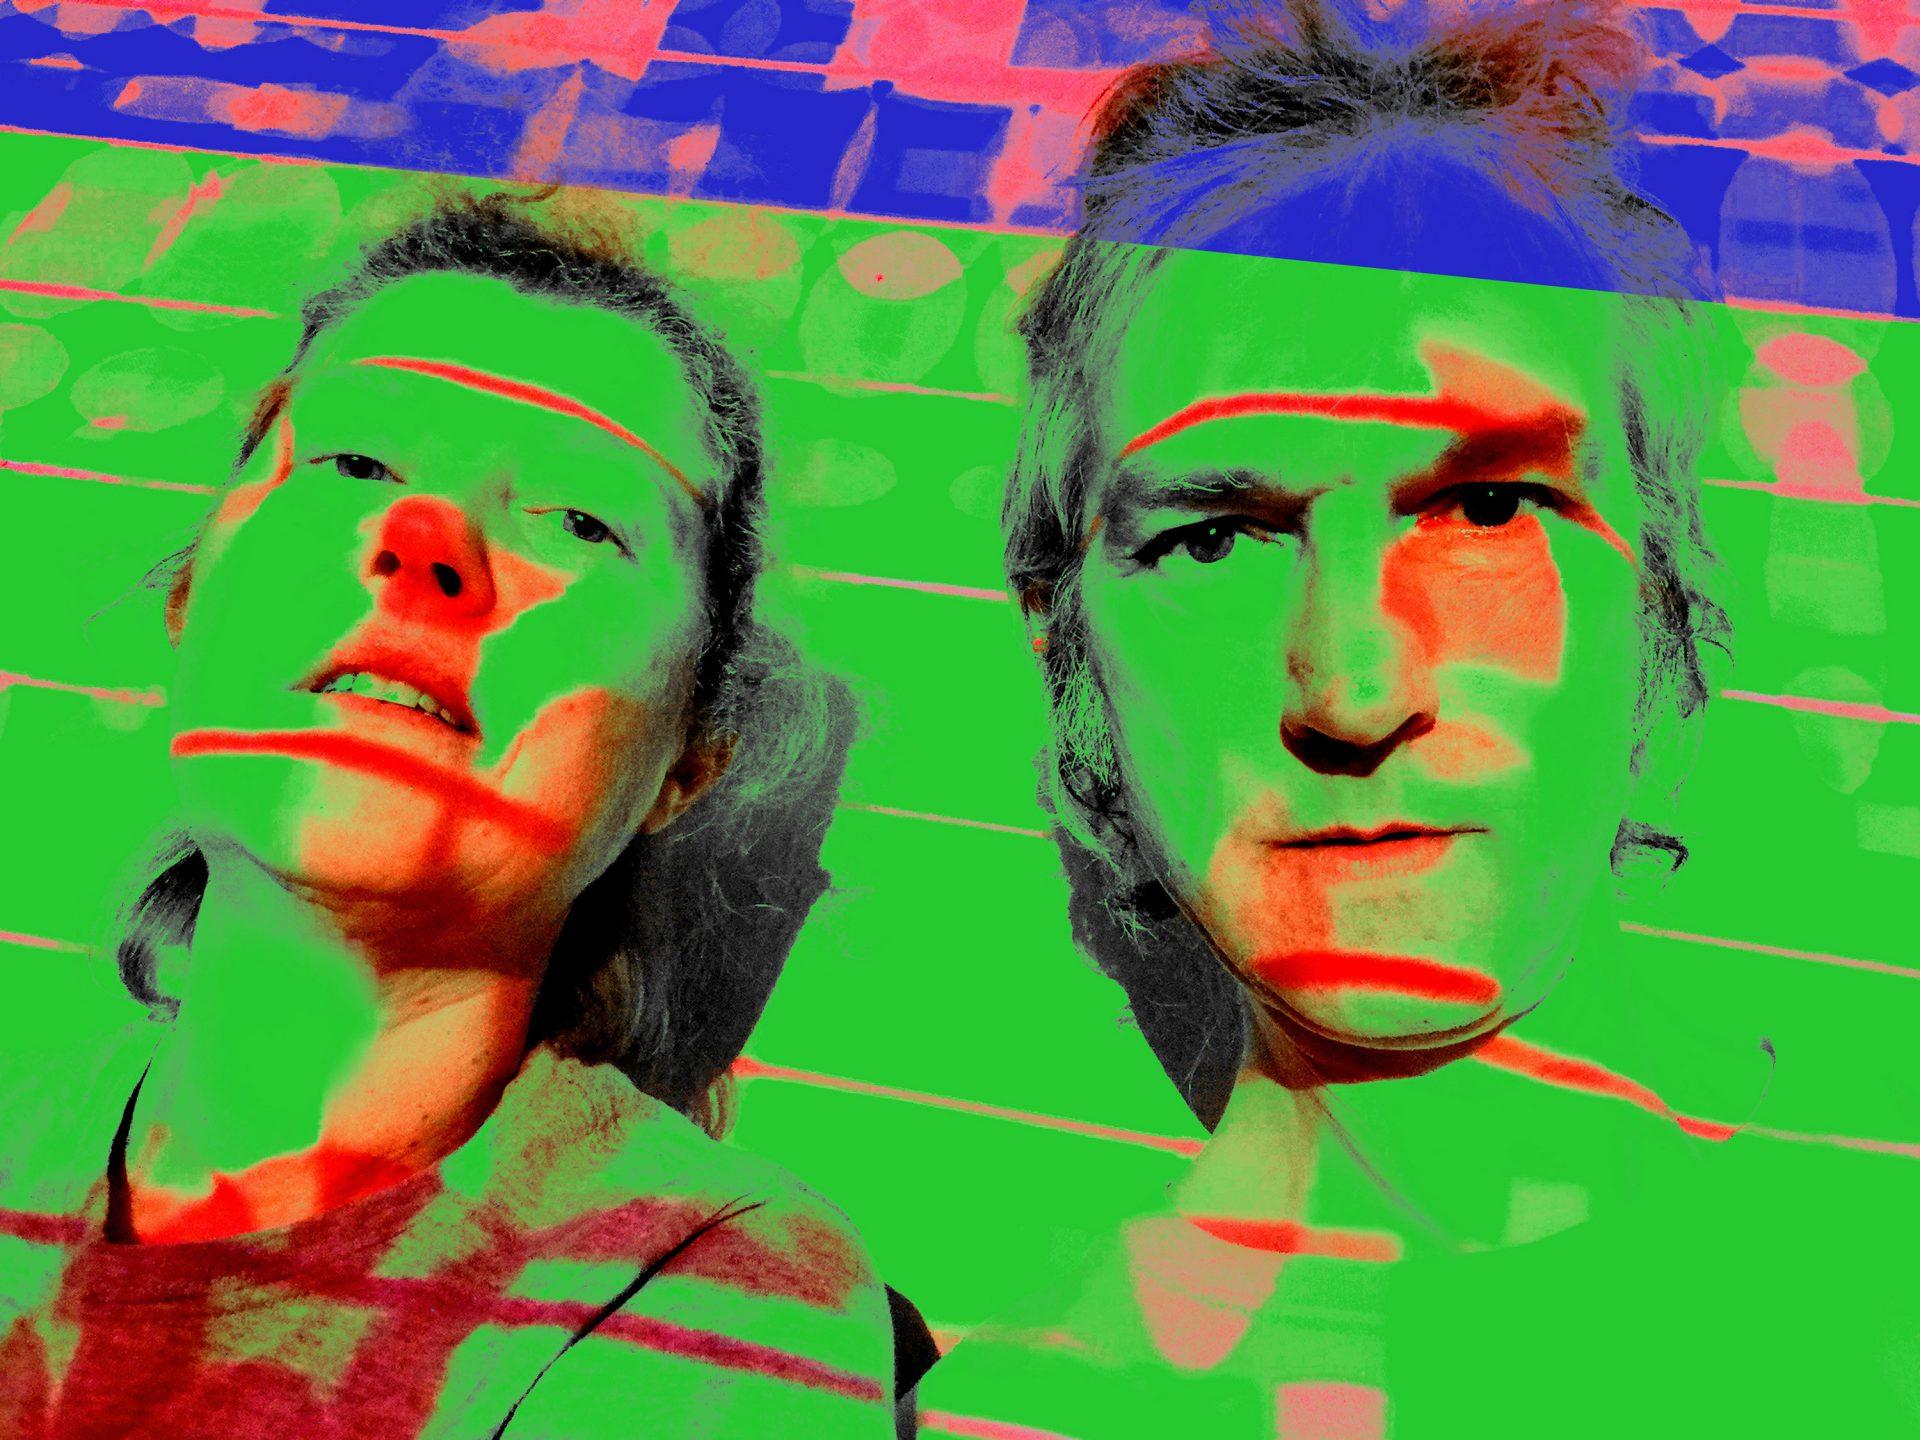 microworld kristiansand, genetic moo, lumen art projects. Sørlandets Kunstmuseum 2021. Et digitalt økosystem for hele familien